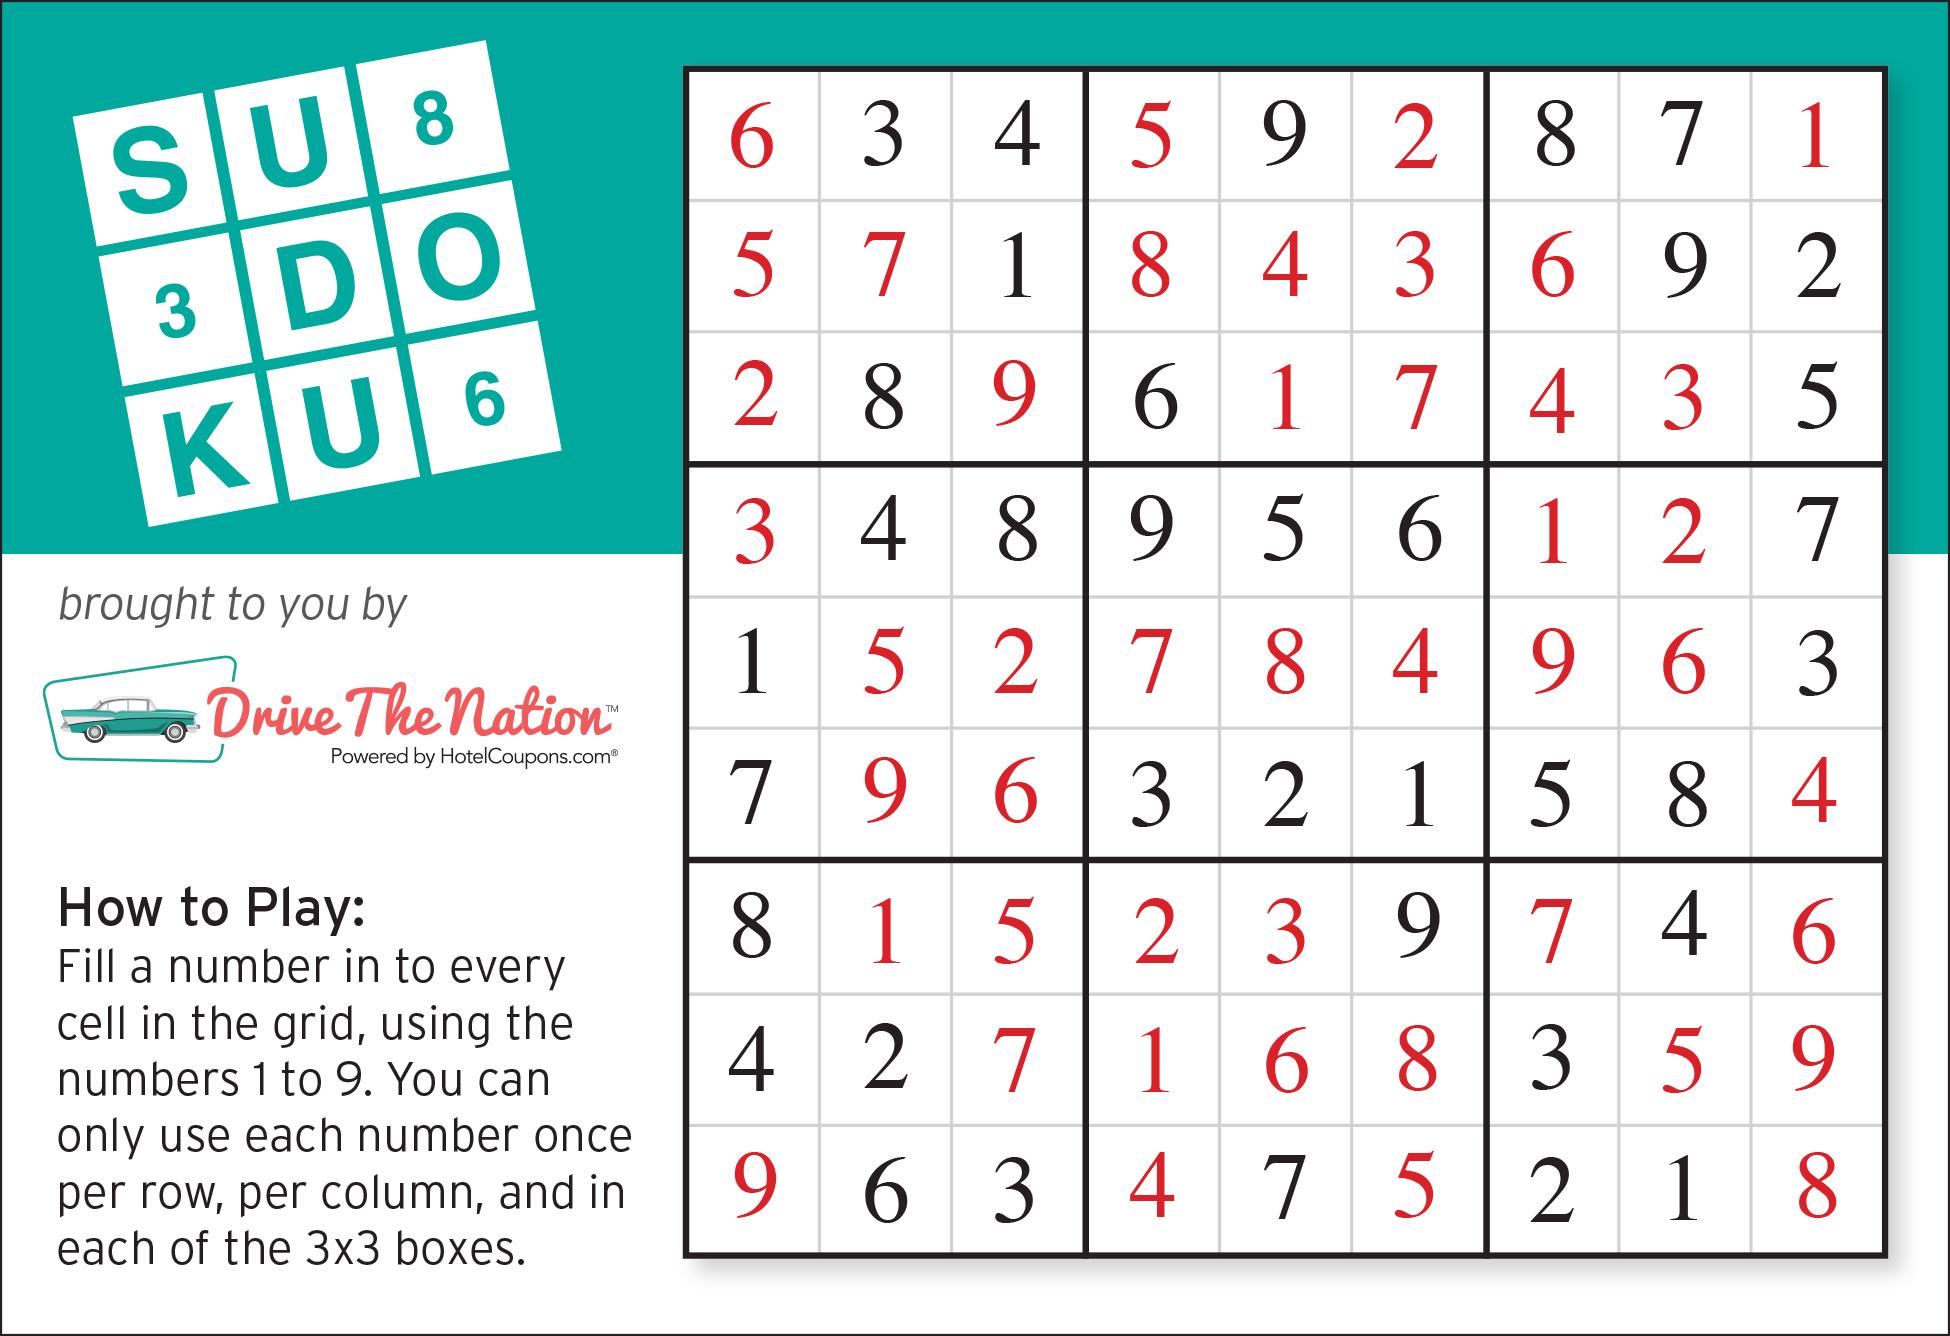 Key - crossword puzzle clue